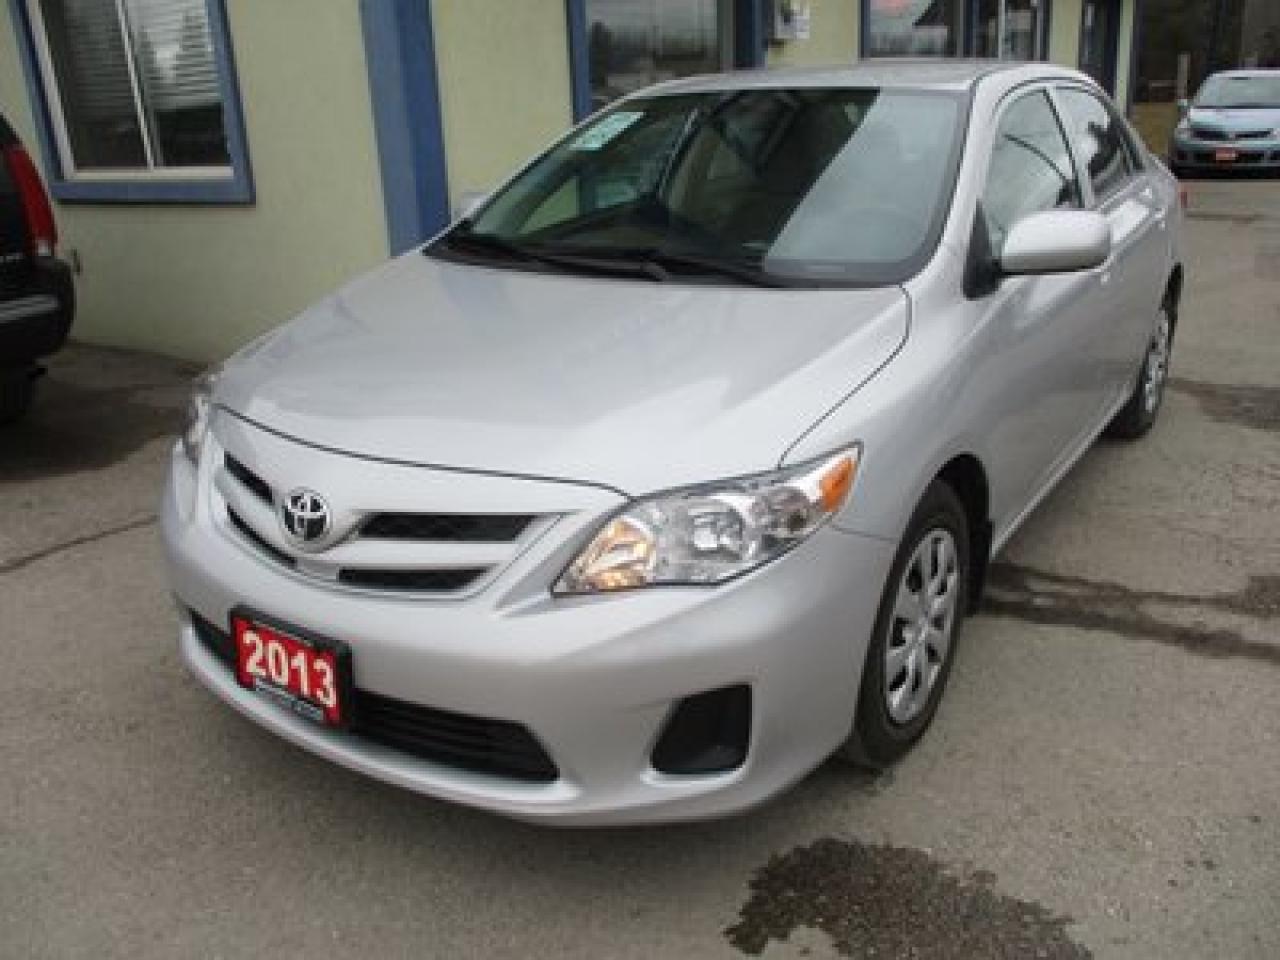 2013 Toyota Corolla GAS SAVING LE MODEL 5 PASSENGER 1.8L - DOHC.. HEATED SEATS.. CD/AUX/USB INPUT.. KEYLESS ENTRY..